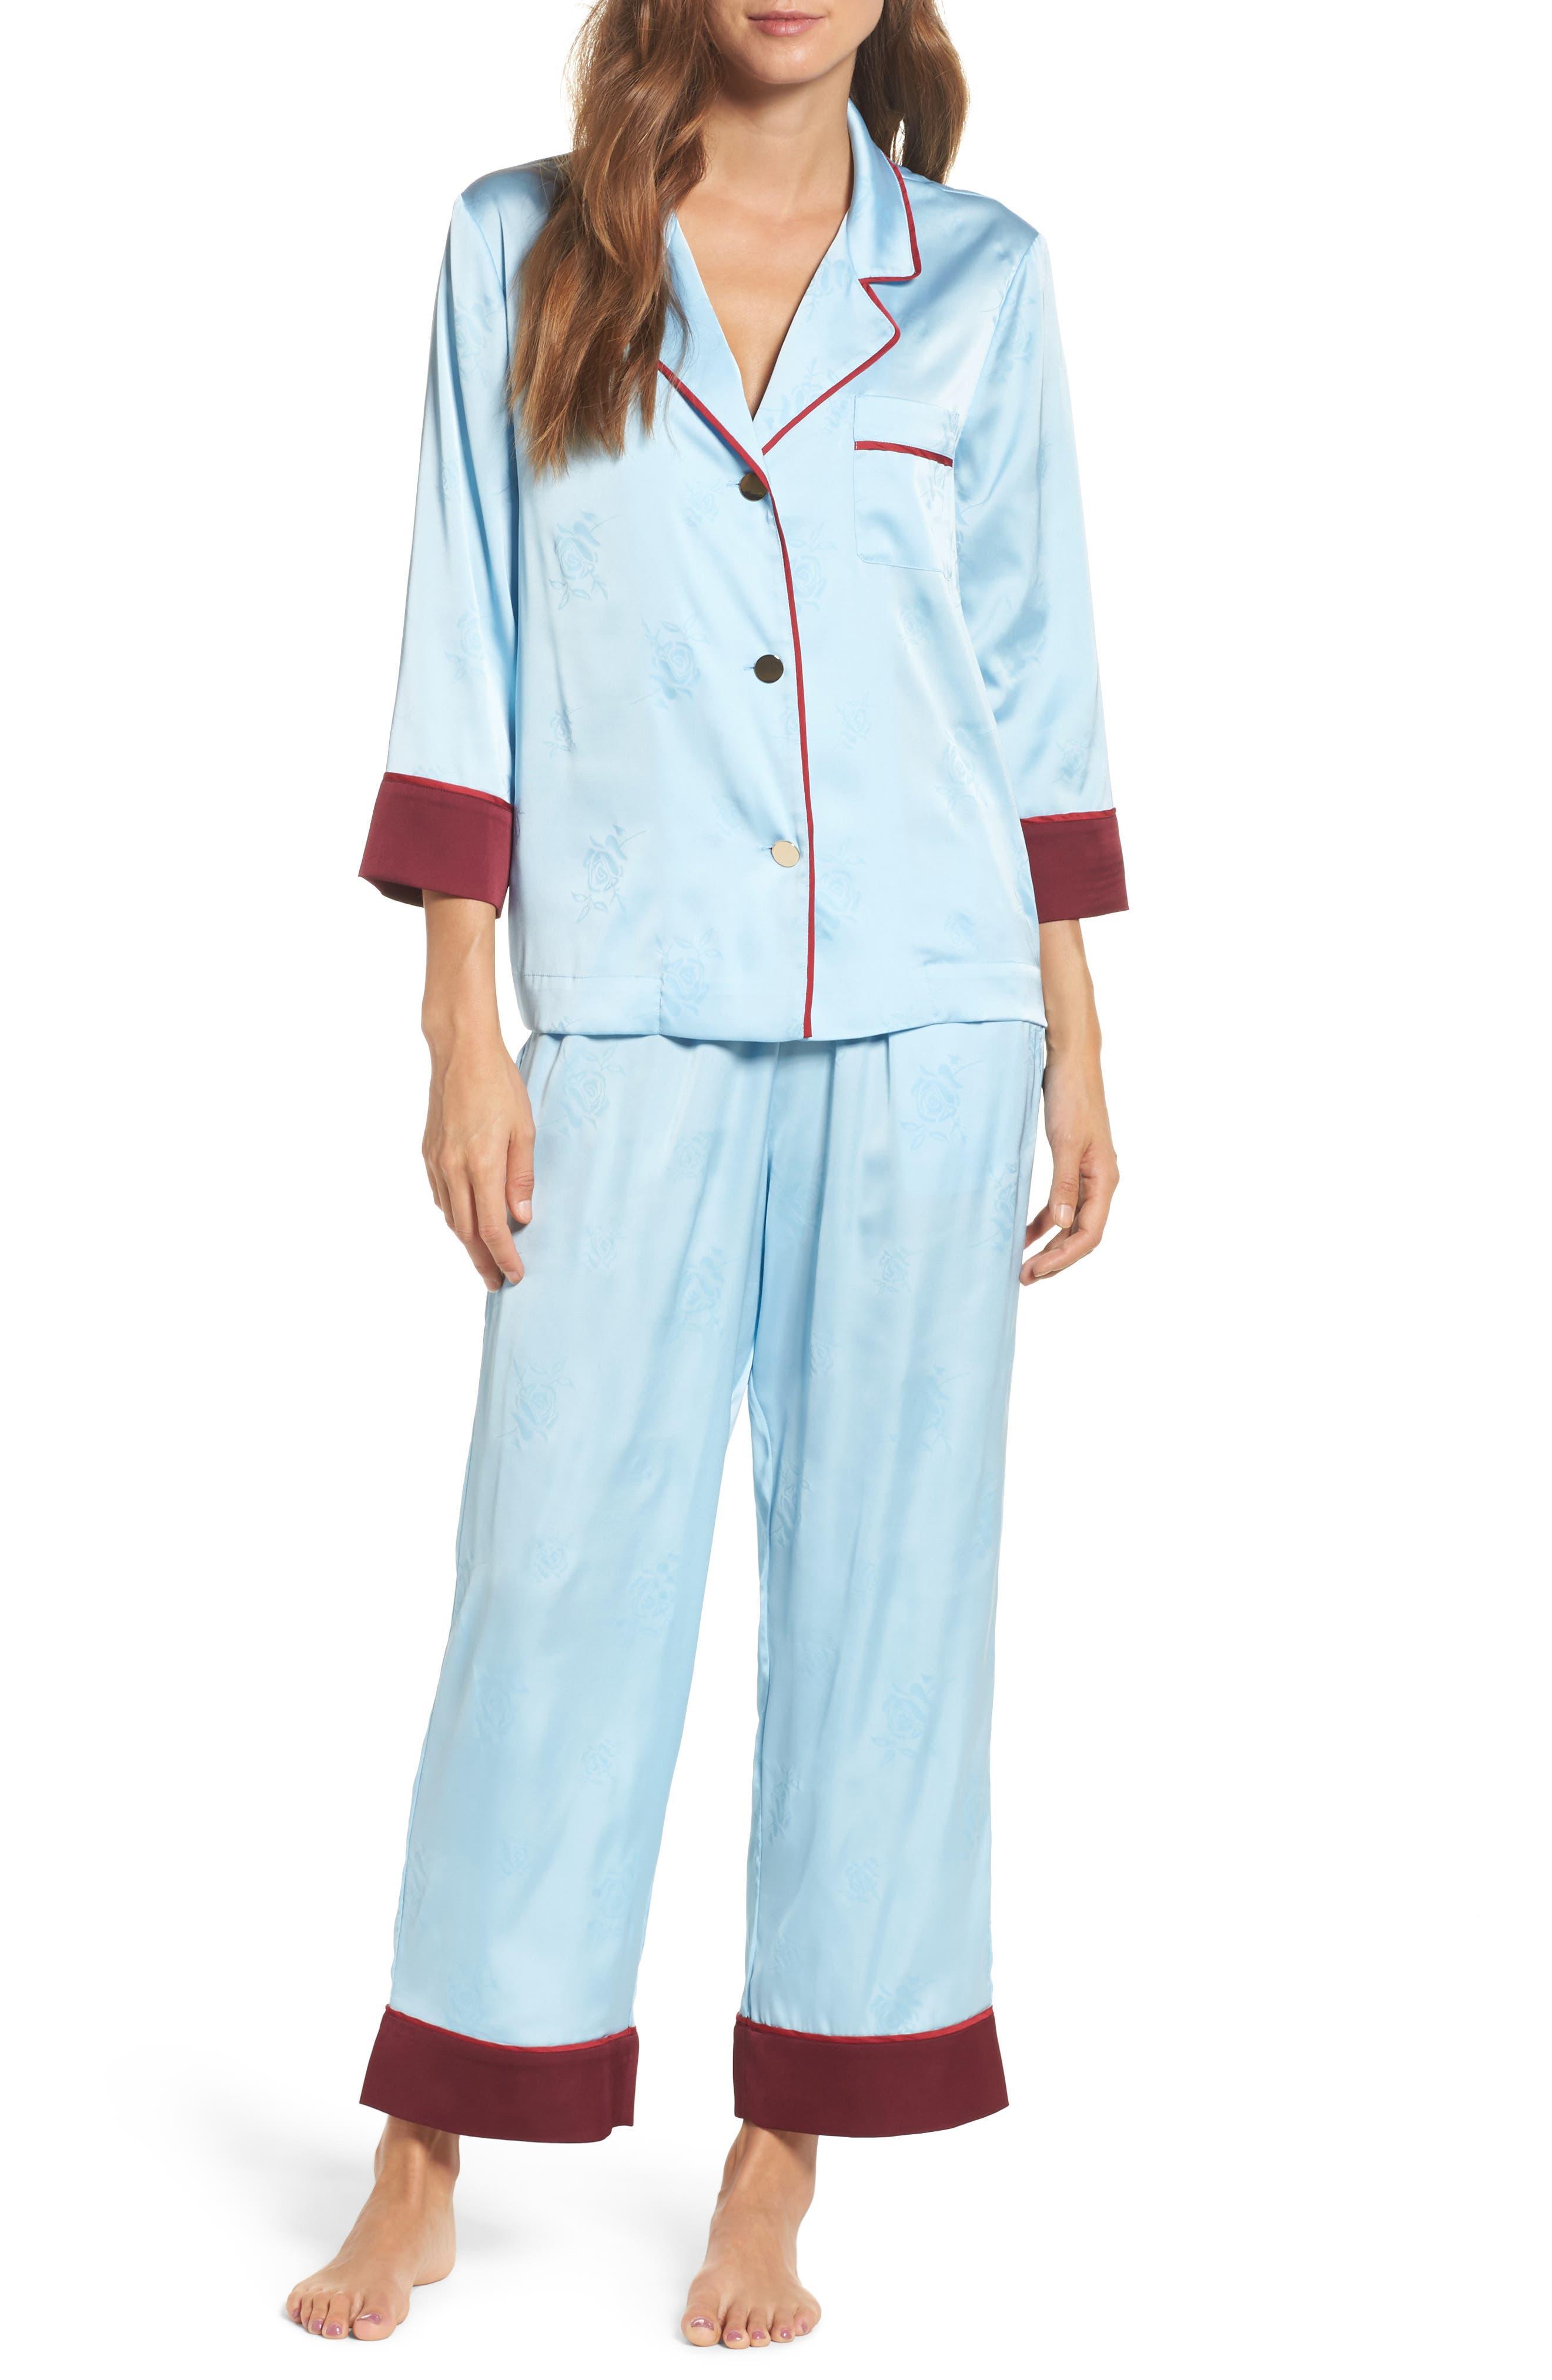 Alternate Image 1 Selected - Bed to Brunch Crop Pajamas